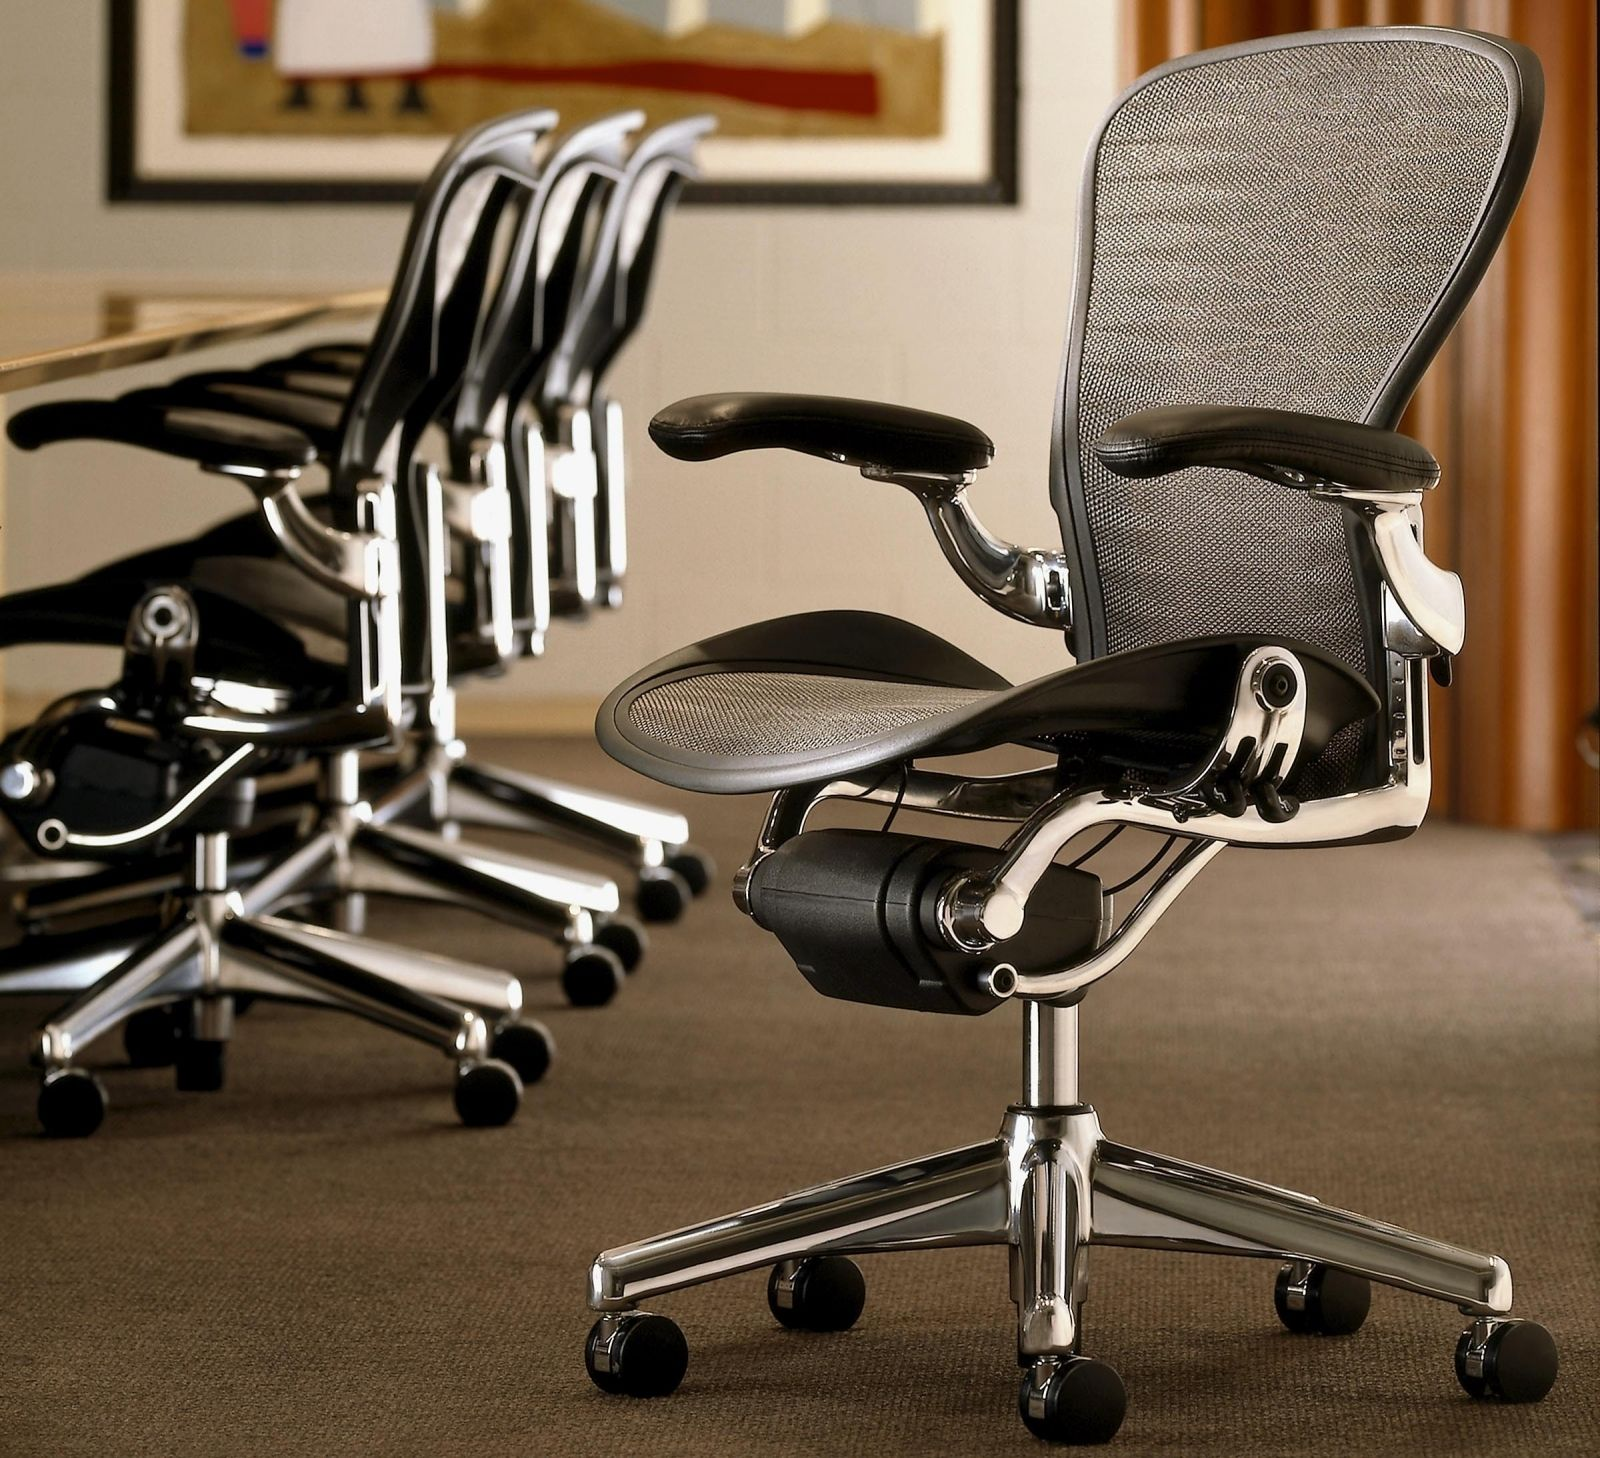 Miller Bürostuhl herman miller aeron chair review interiors design ideas